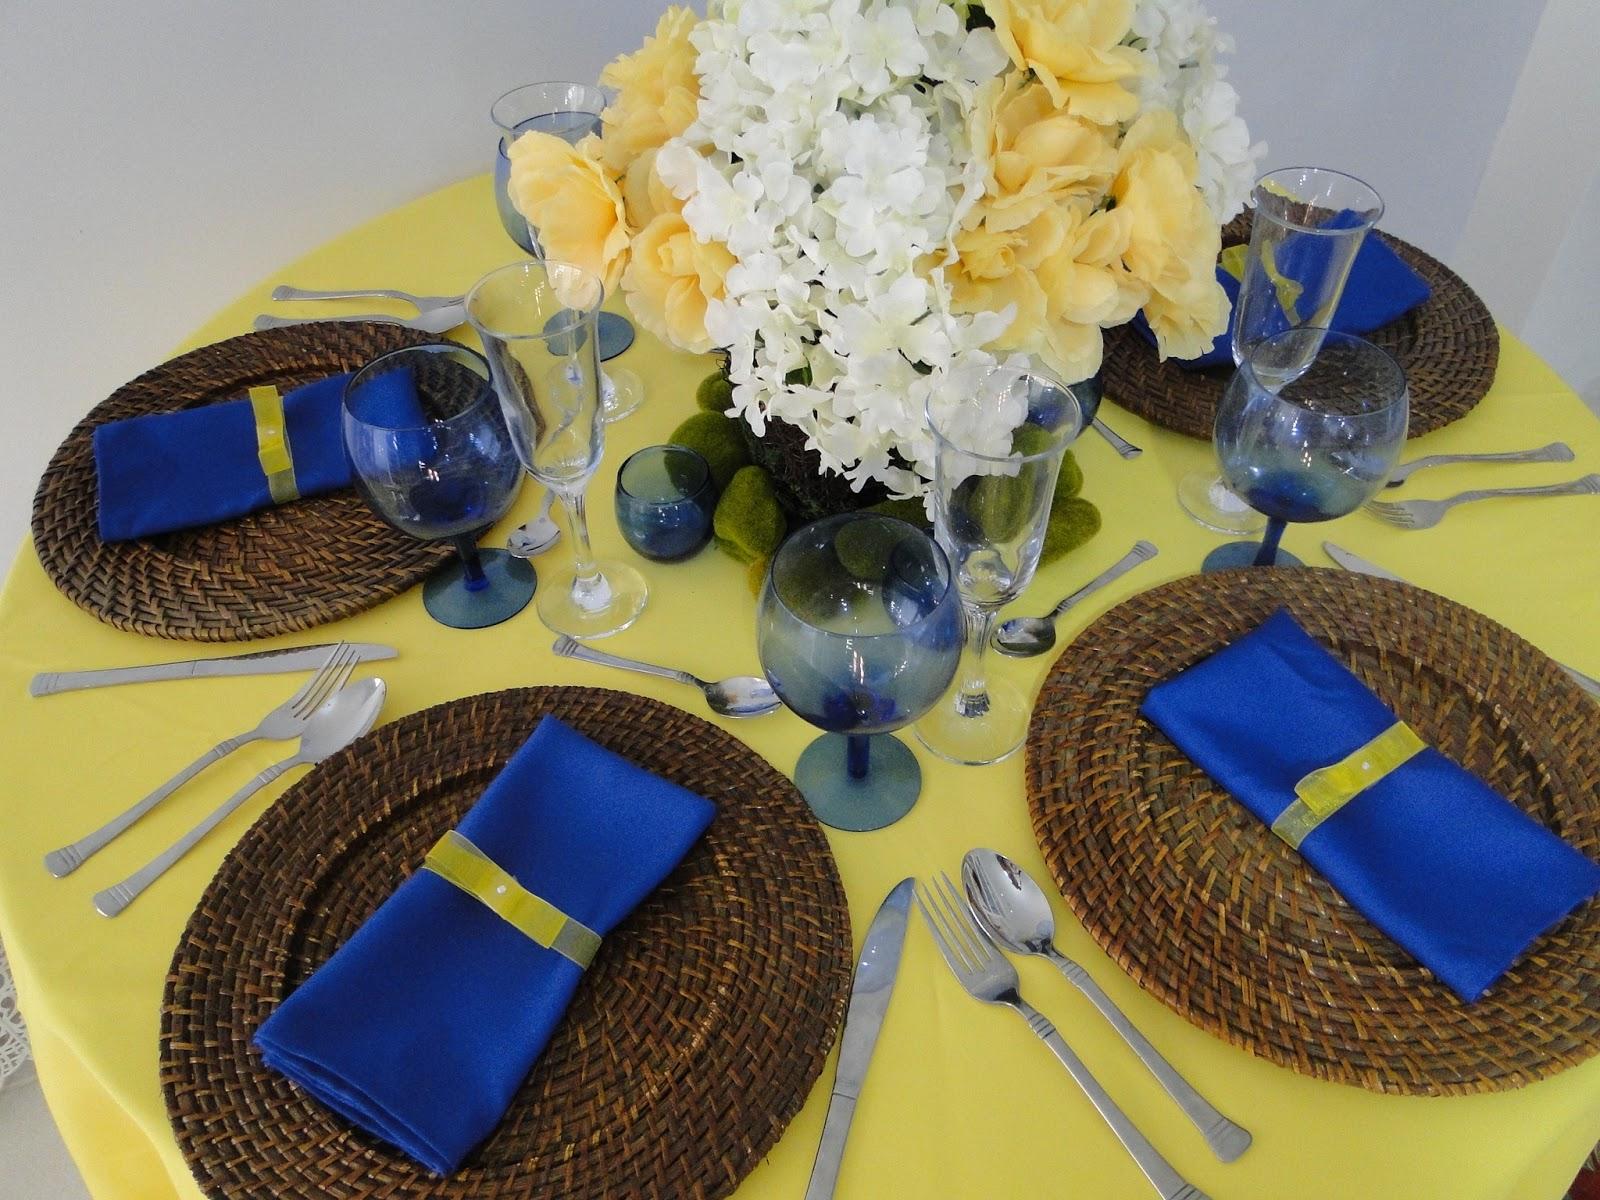 decoracao azul royal e amarelo casamento : decoracao azul royal e amarelo casamento:Dia de festa é só alegria.: Amarelo ouro com azul royal